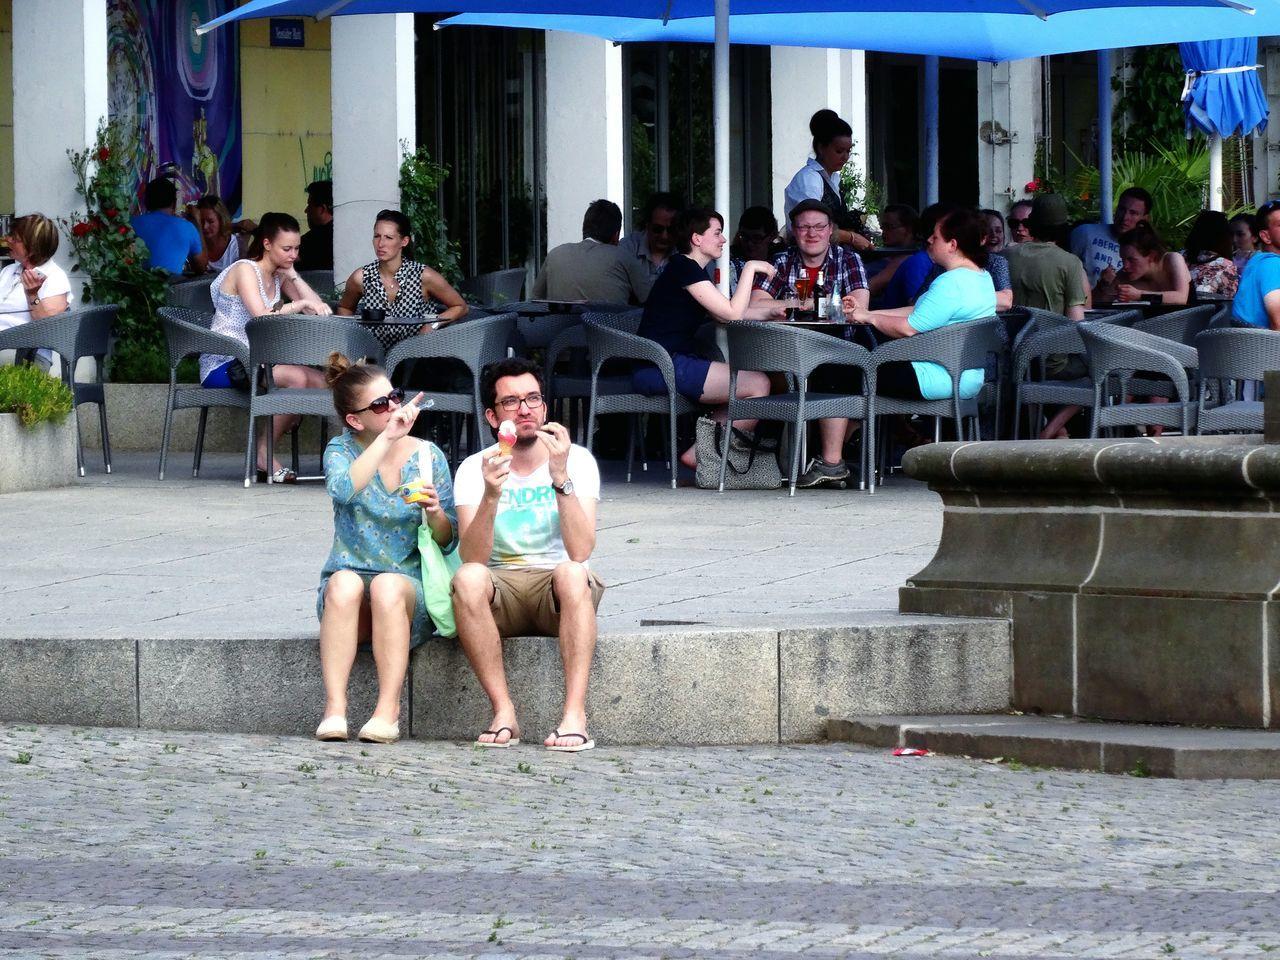 Do you see that? Relaxing Enjoying The Sun Ice Cream EEA3 - Dresden EEA3 Eye4photography  Streetphotography The Street Photographer - 2015 EyeEm Awards Summer Views TwentySomething